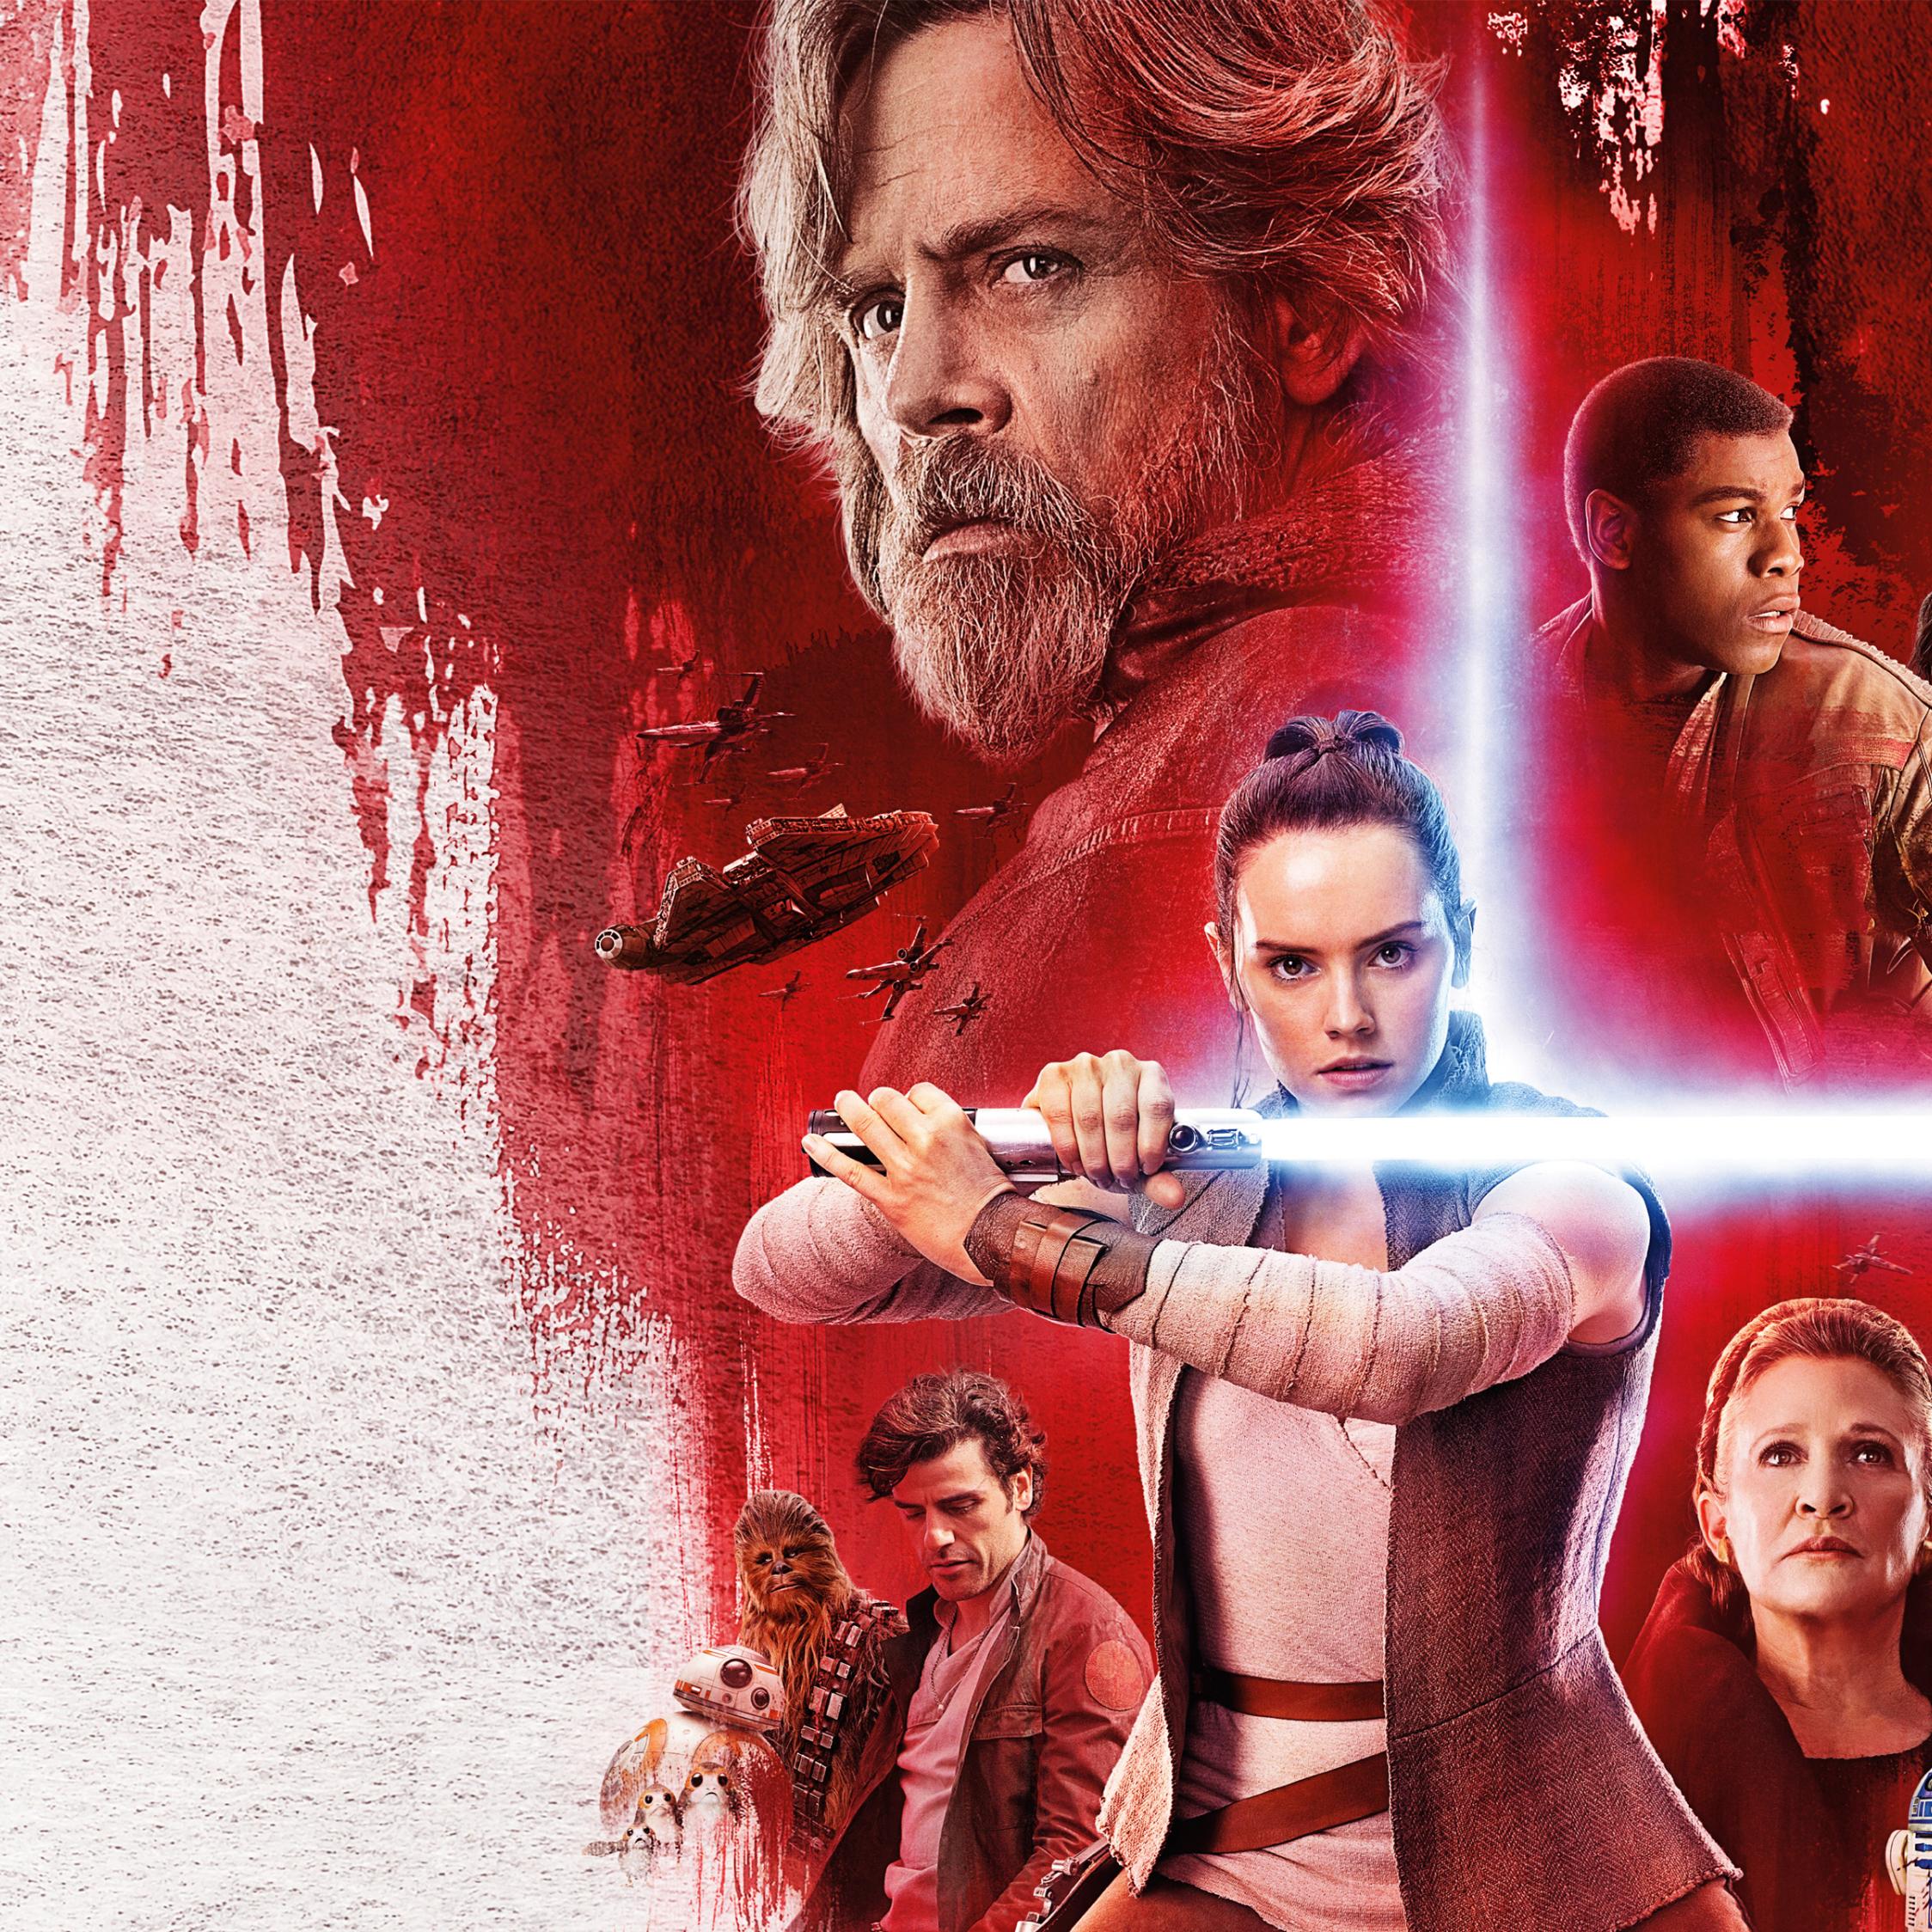 Jedi Wallpaper: Star Wars 8 Poster, HD 4K Wallpaper